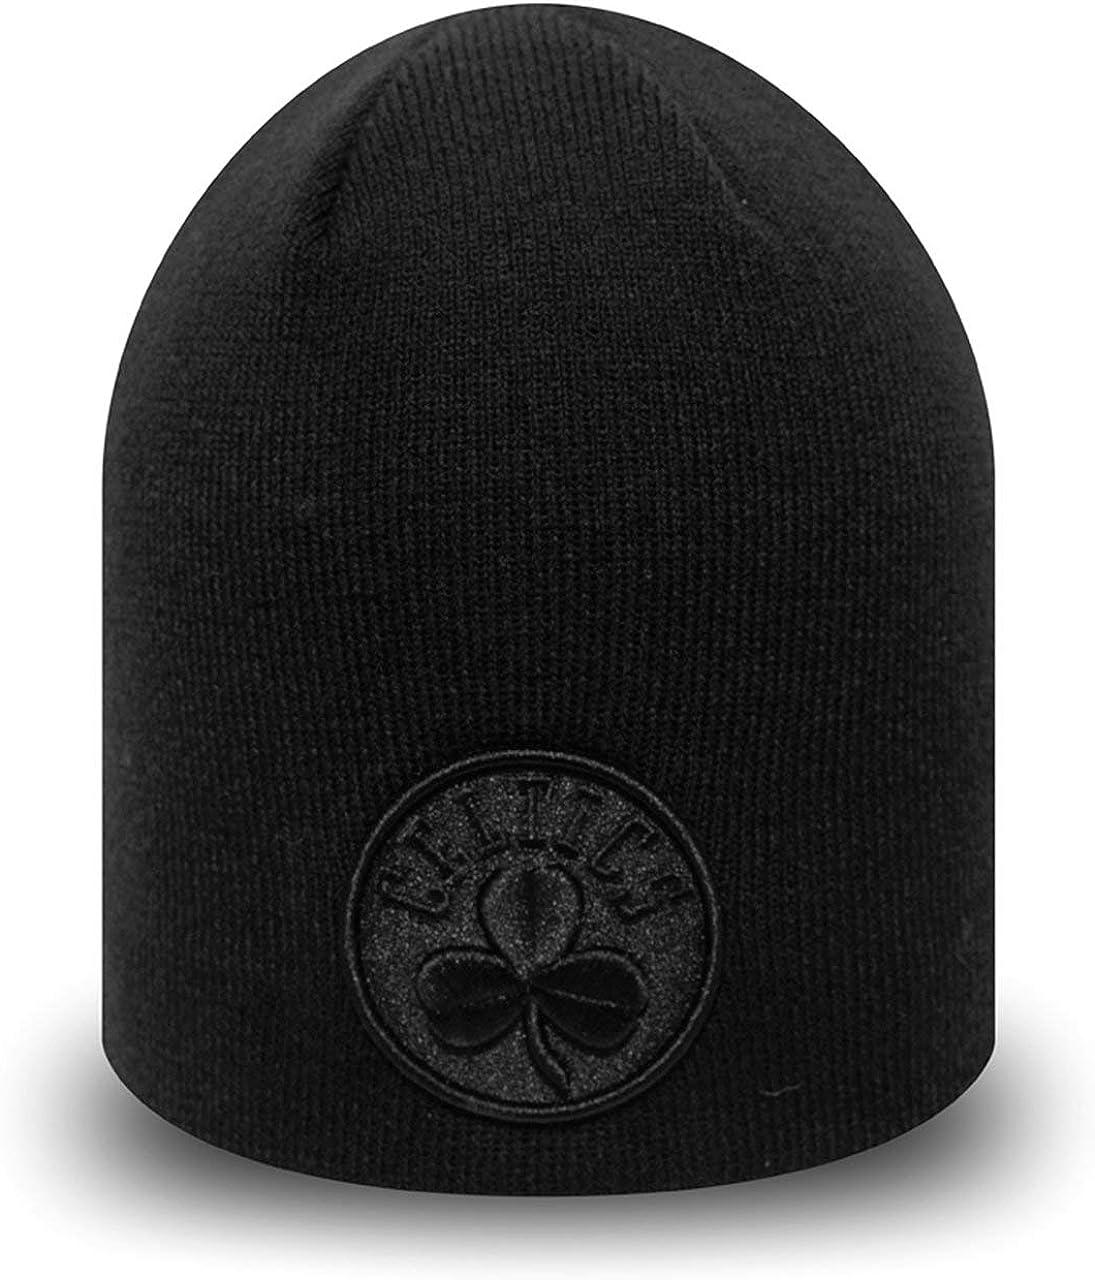 New Era Boston Celtics Beanie Dark Base Skull Knit